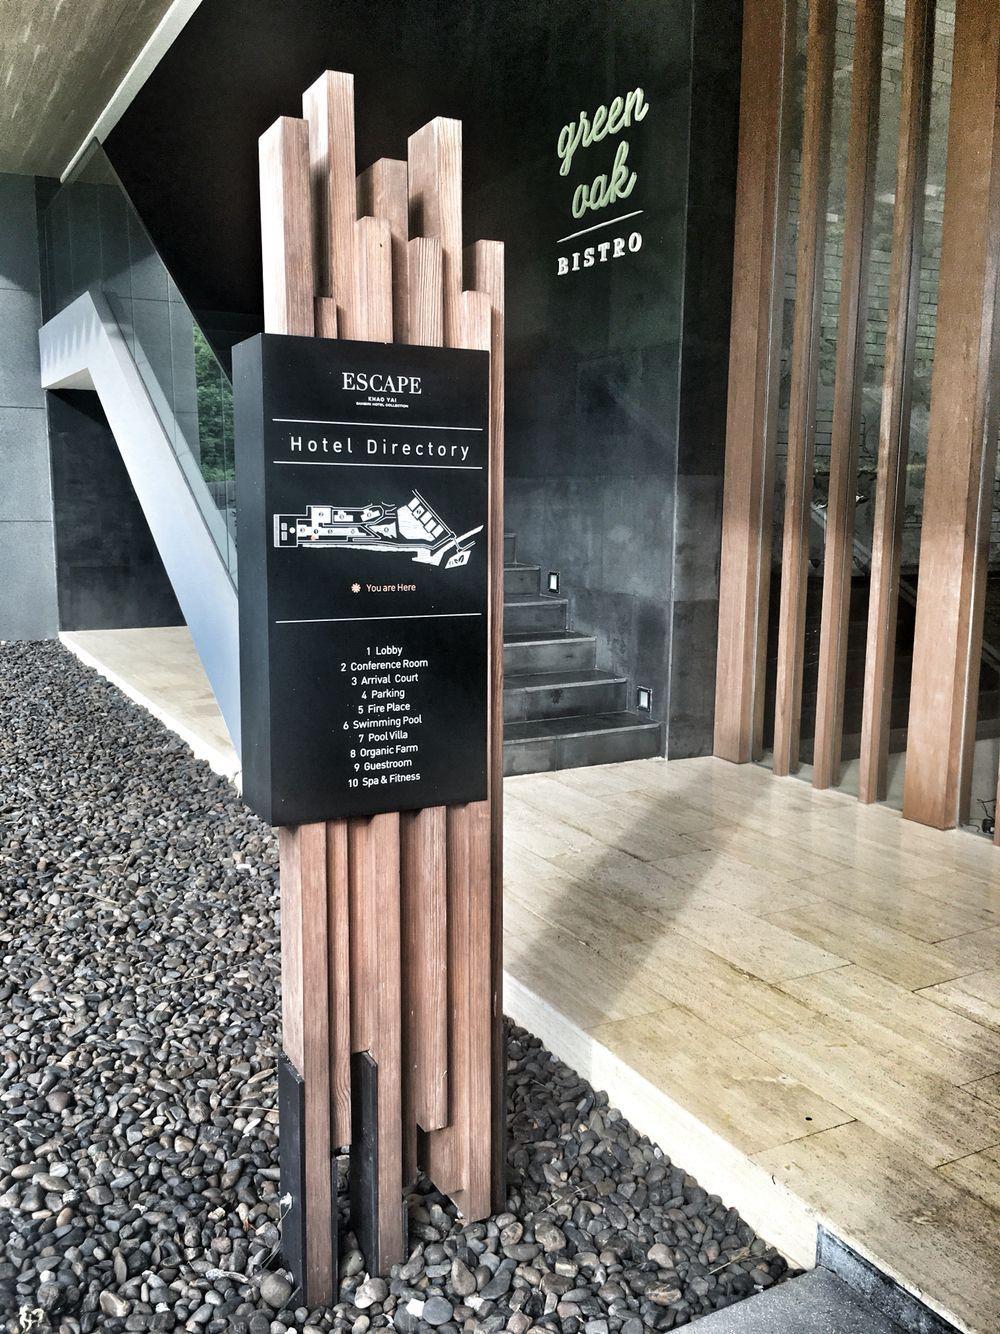 Pin by Ankur Jayakar on Design | Exterior signage, Signage ...